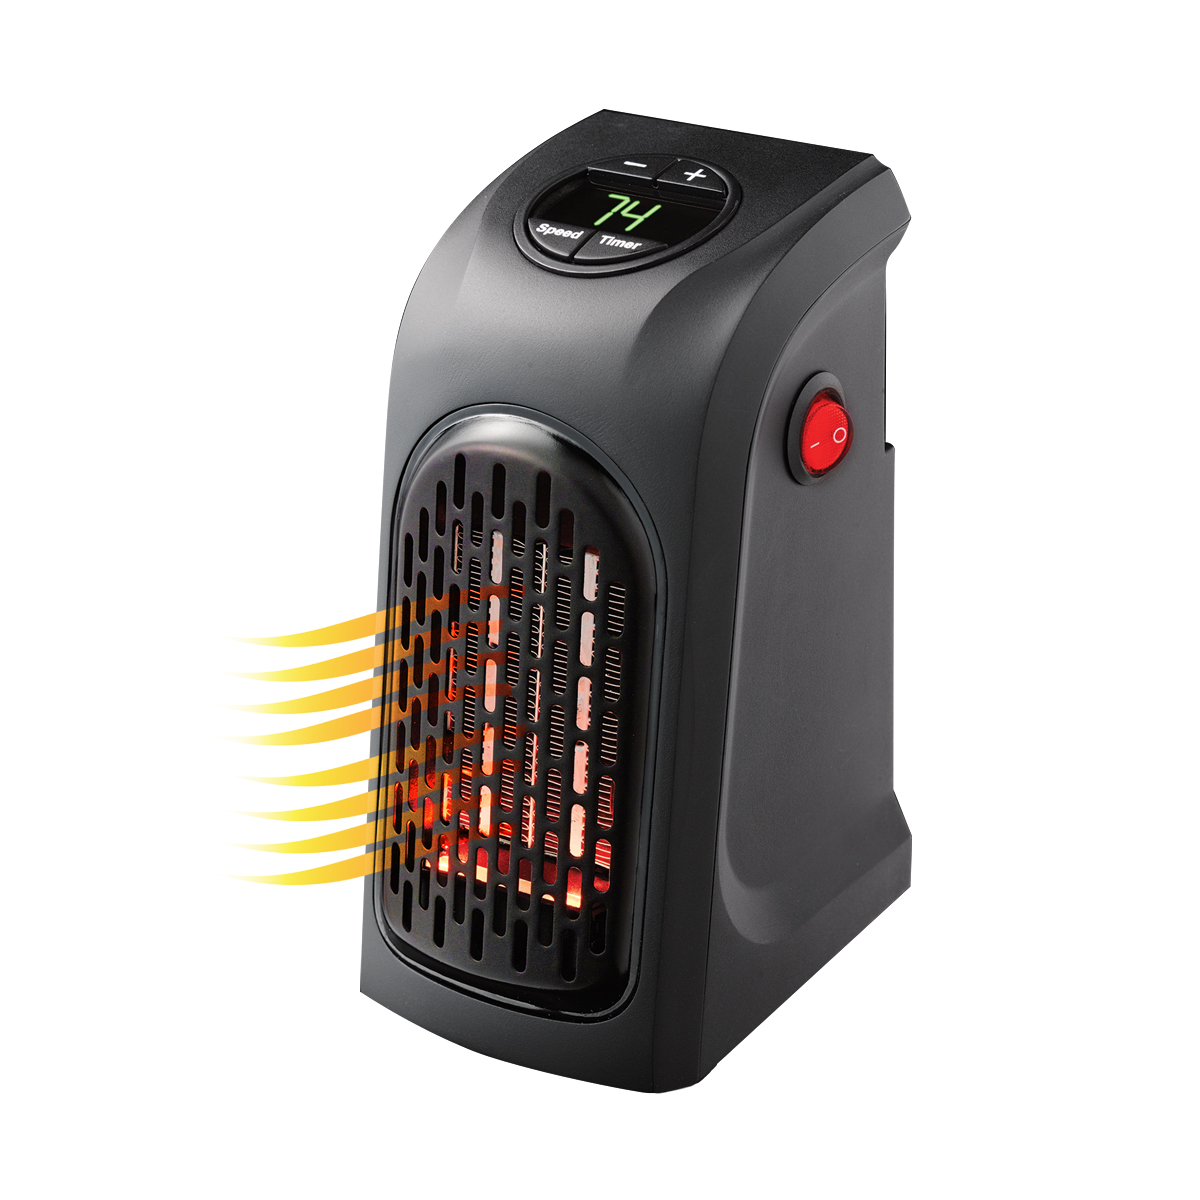 jml handy heater compact plug in digital electric heater